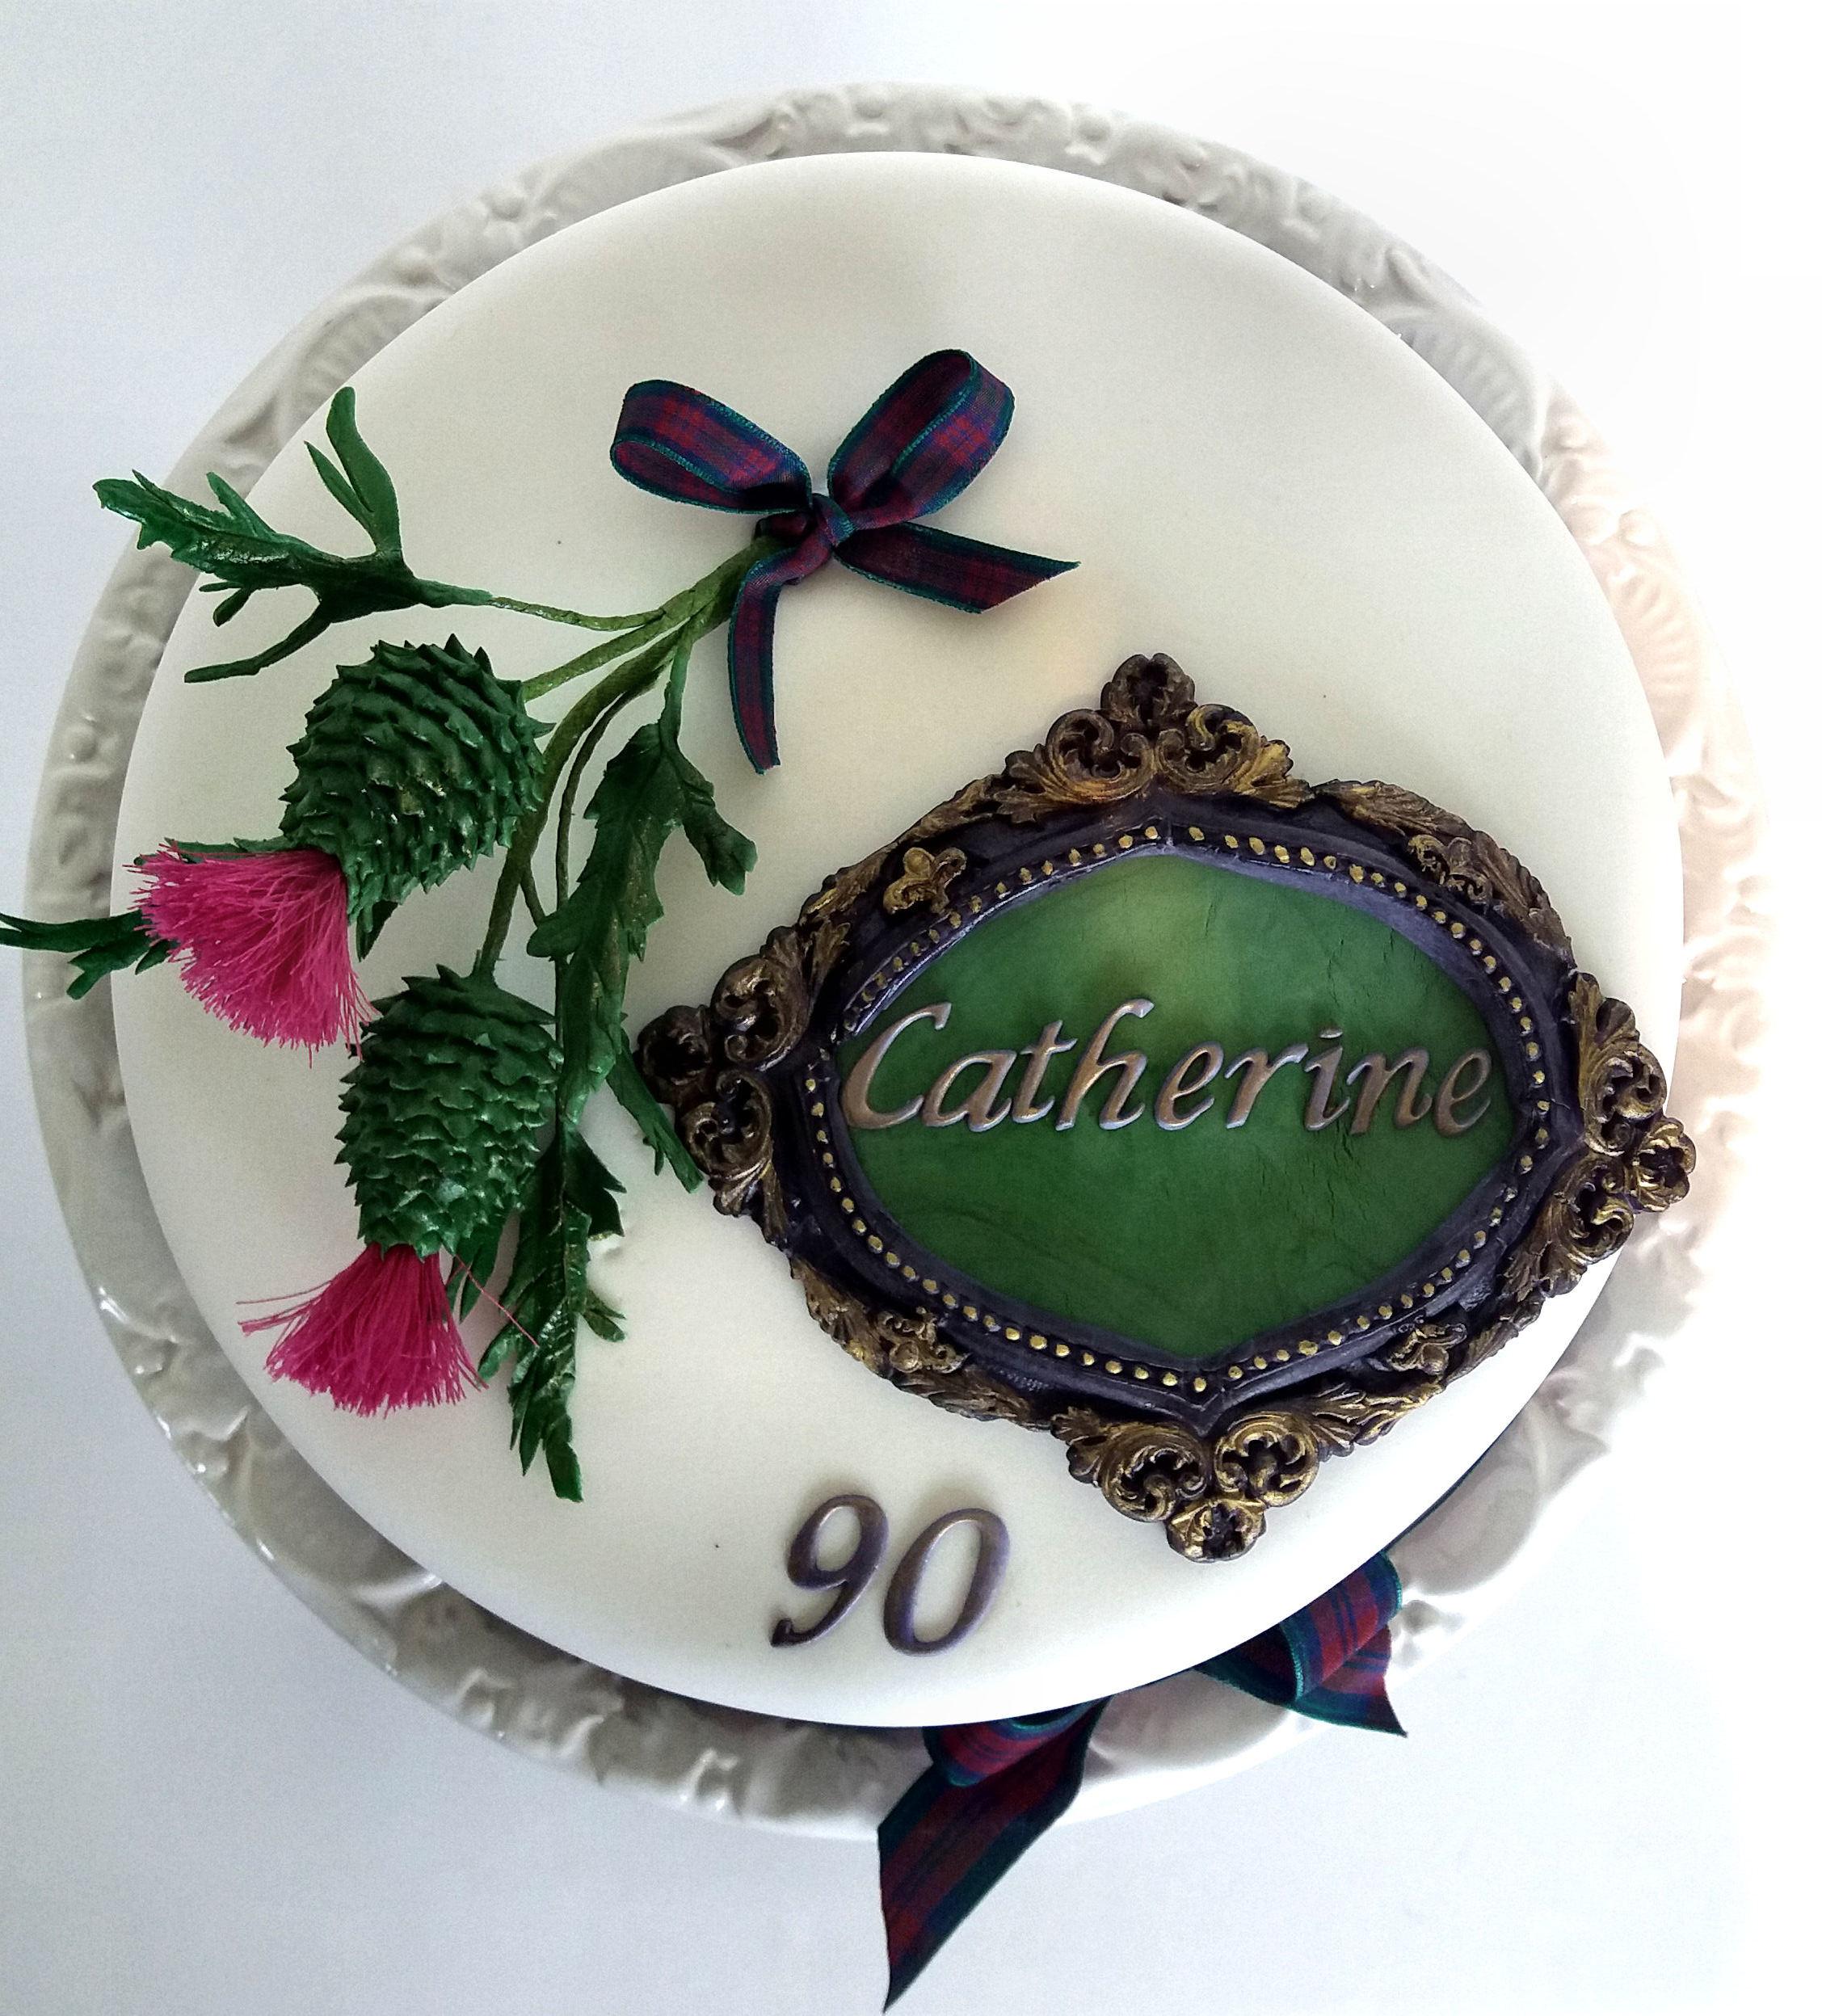 scottish cake2.jpg